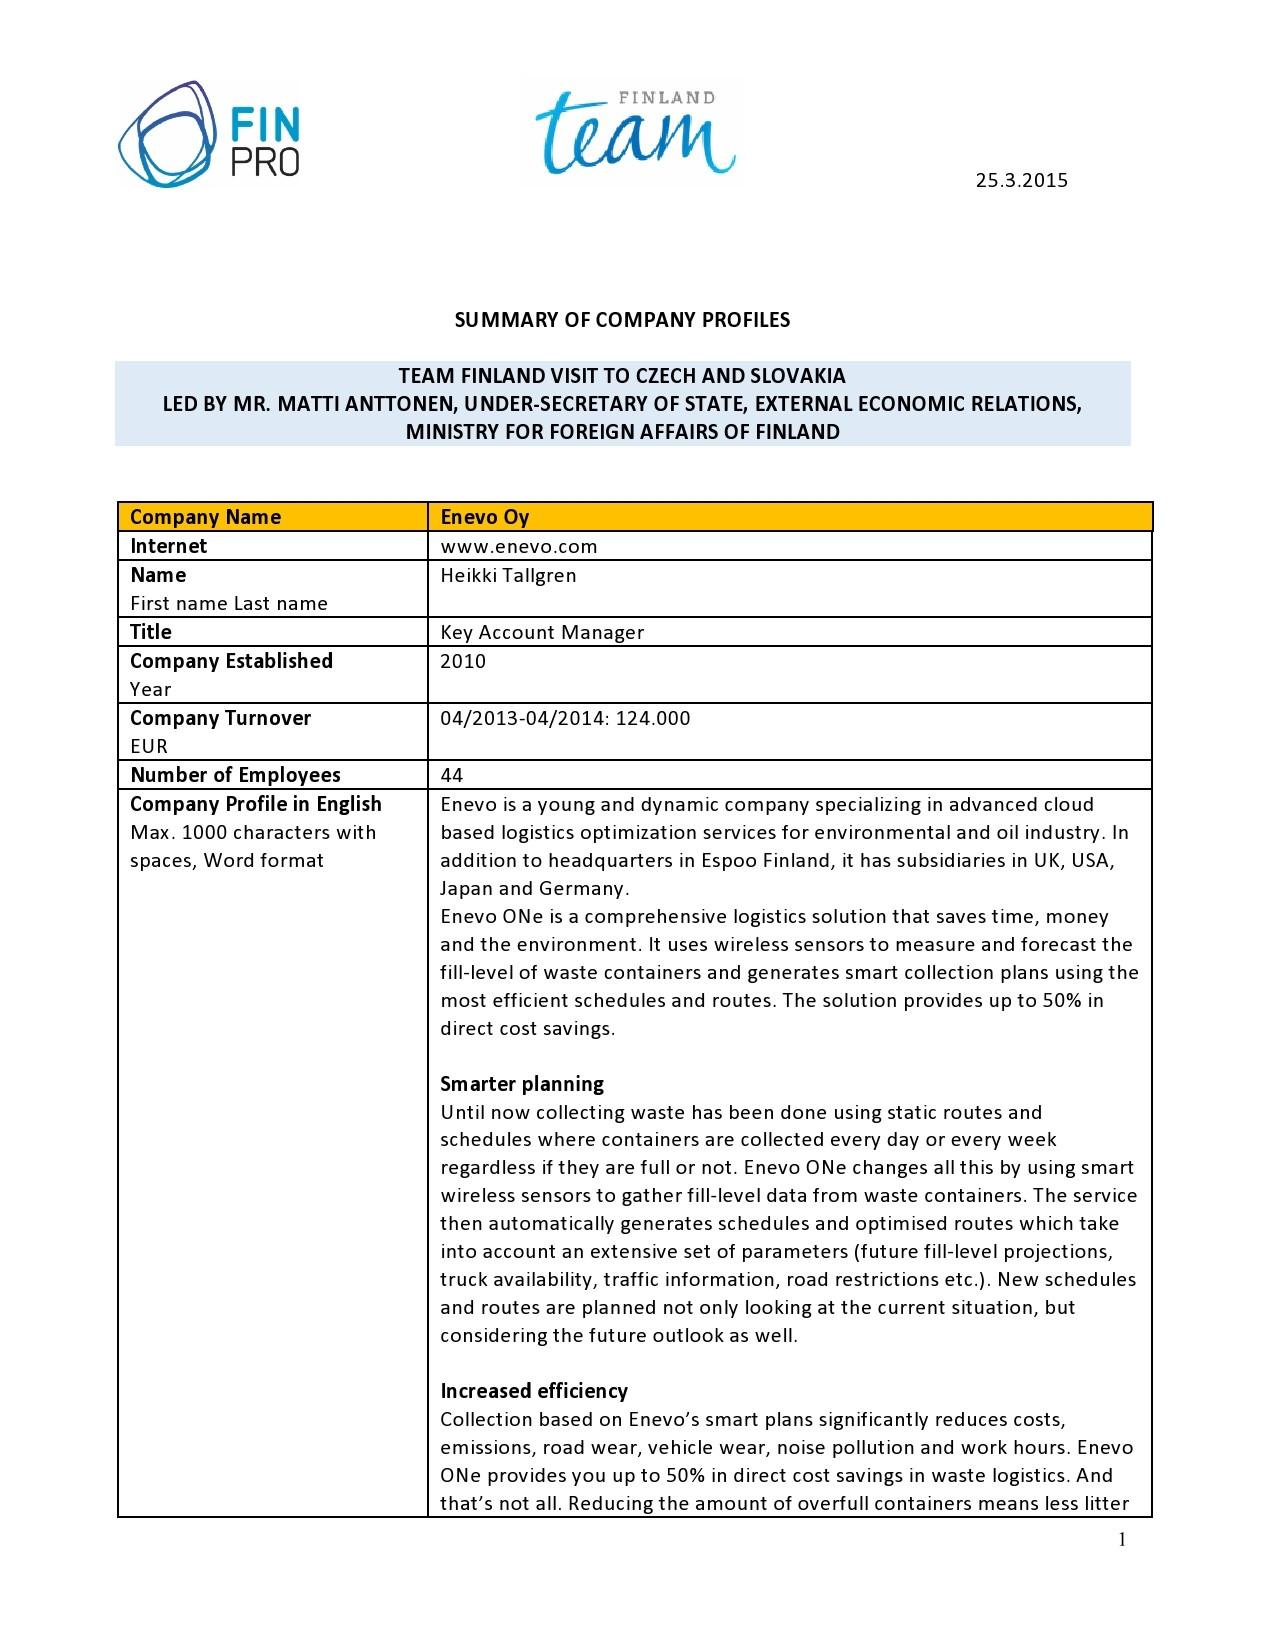 Free company profile template 30